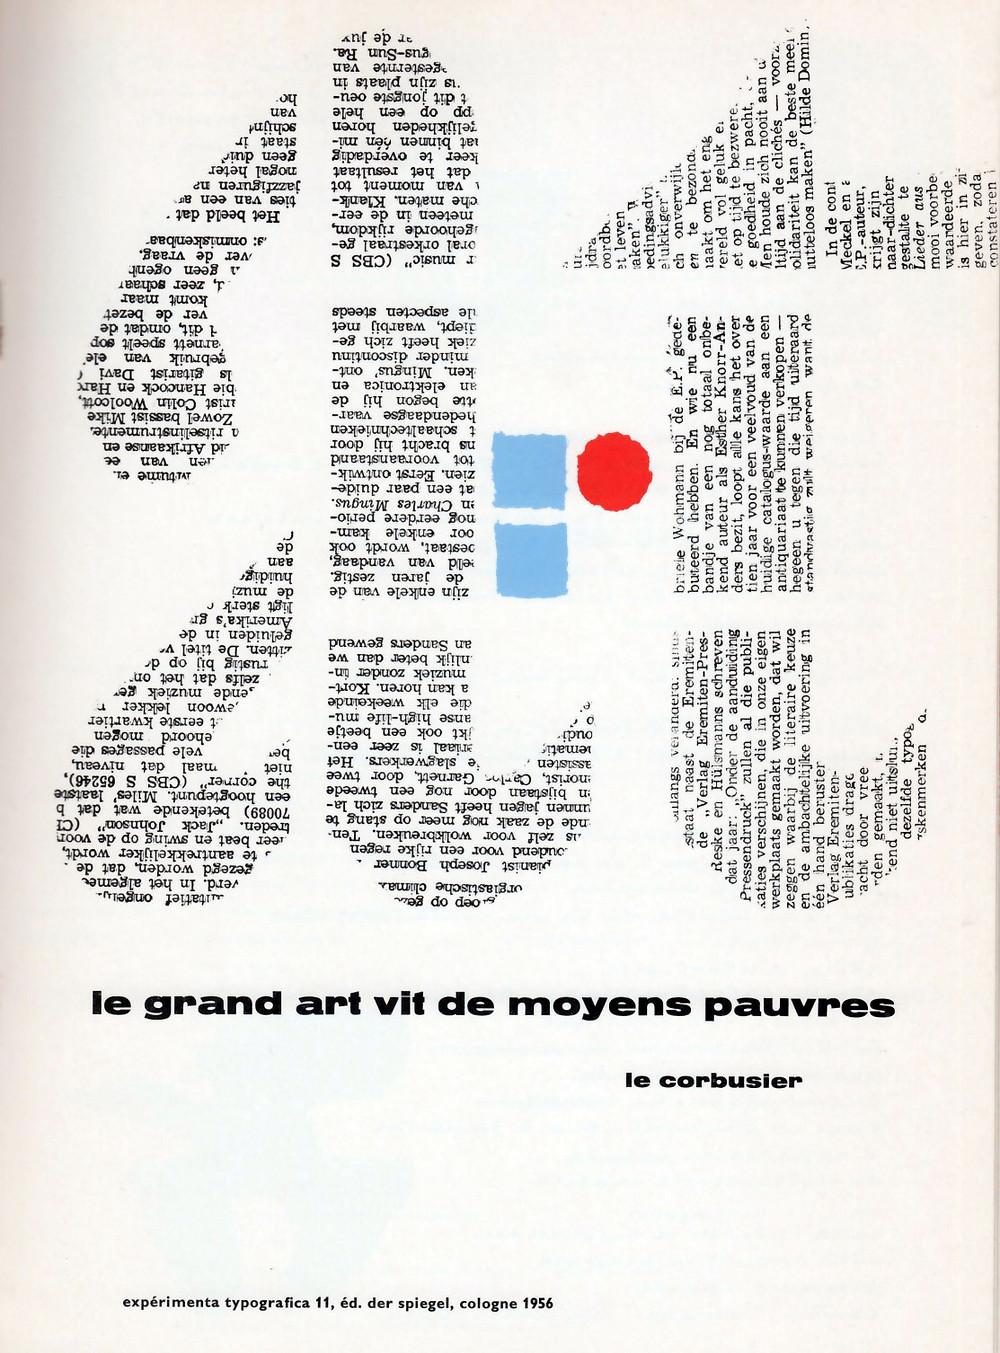 Expérimenta Typografica 11, 1956.